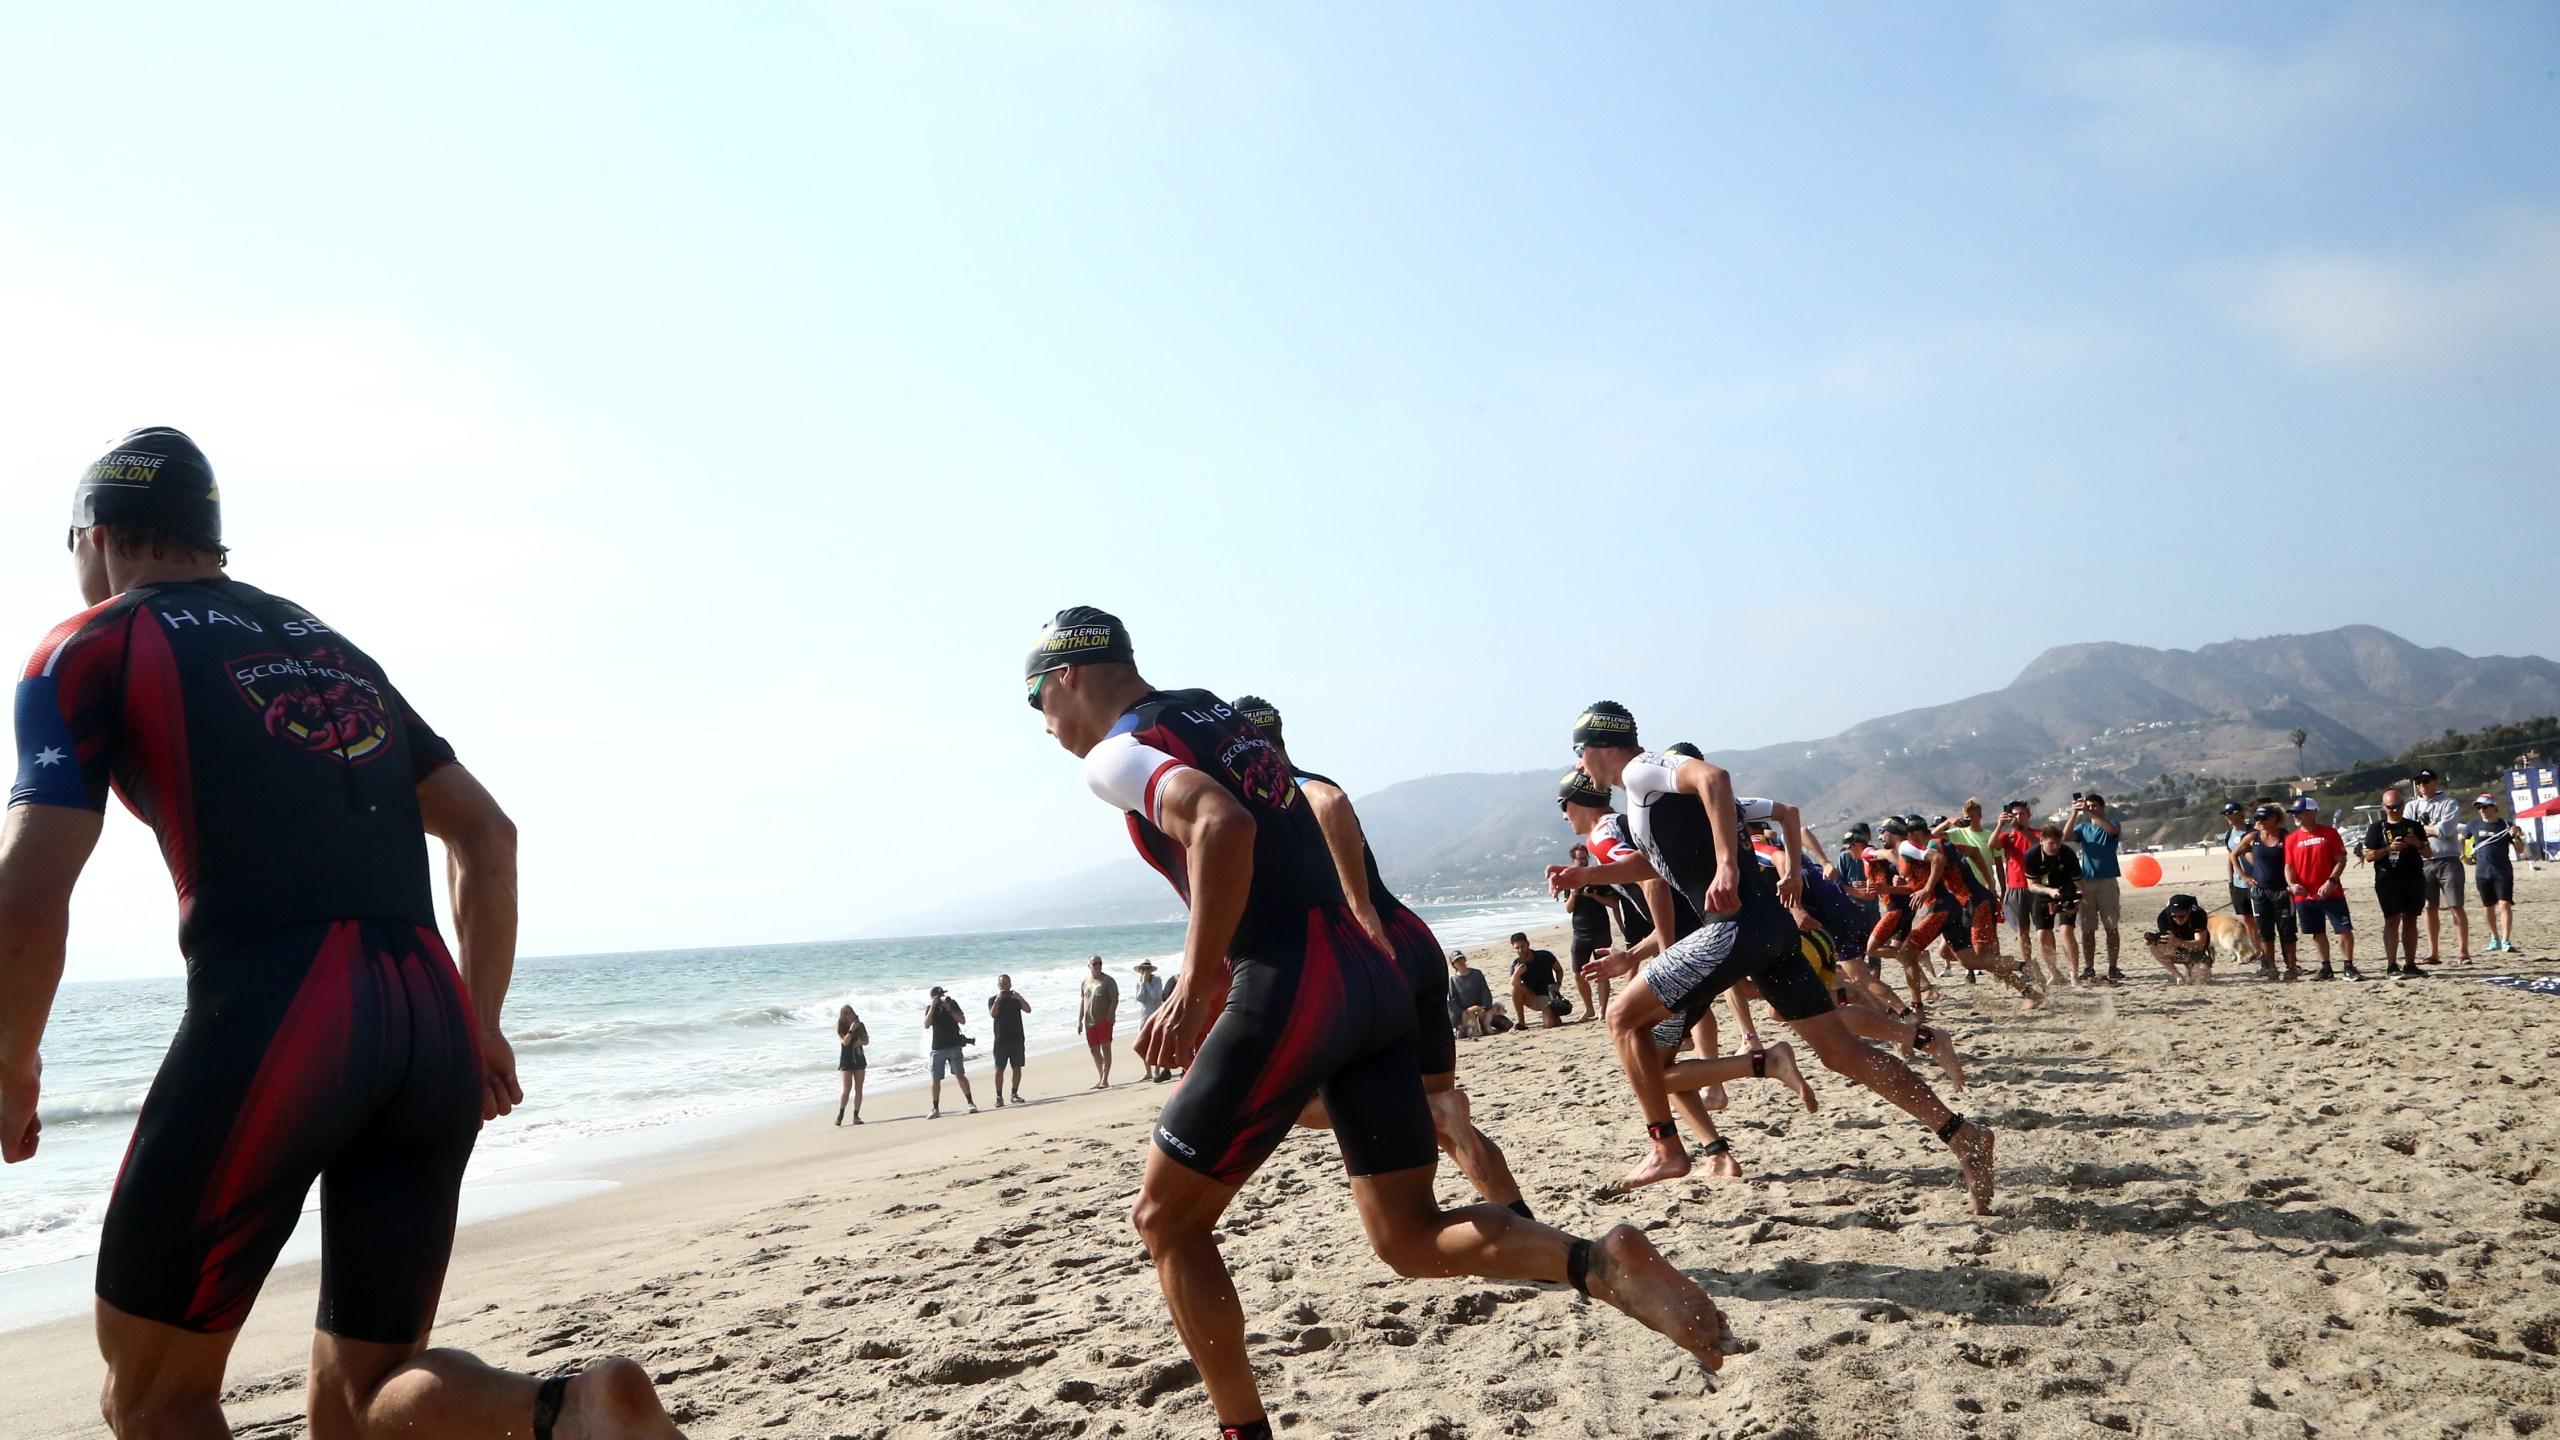 Athletes compete the men's pro Super League Malibu Triathlon, on September 25, 2021 in Zuma Beach, California. (Tommaso Boddi/Getty Images for 2XU Malibu Triathlon)